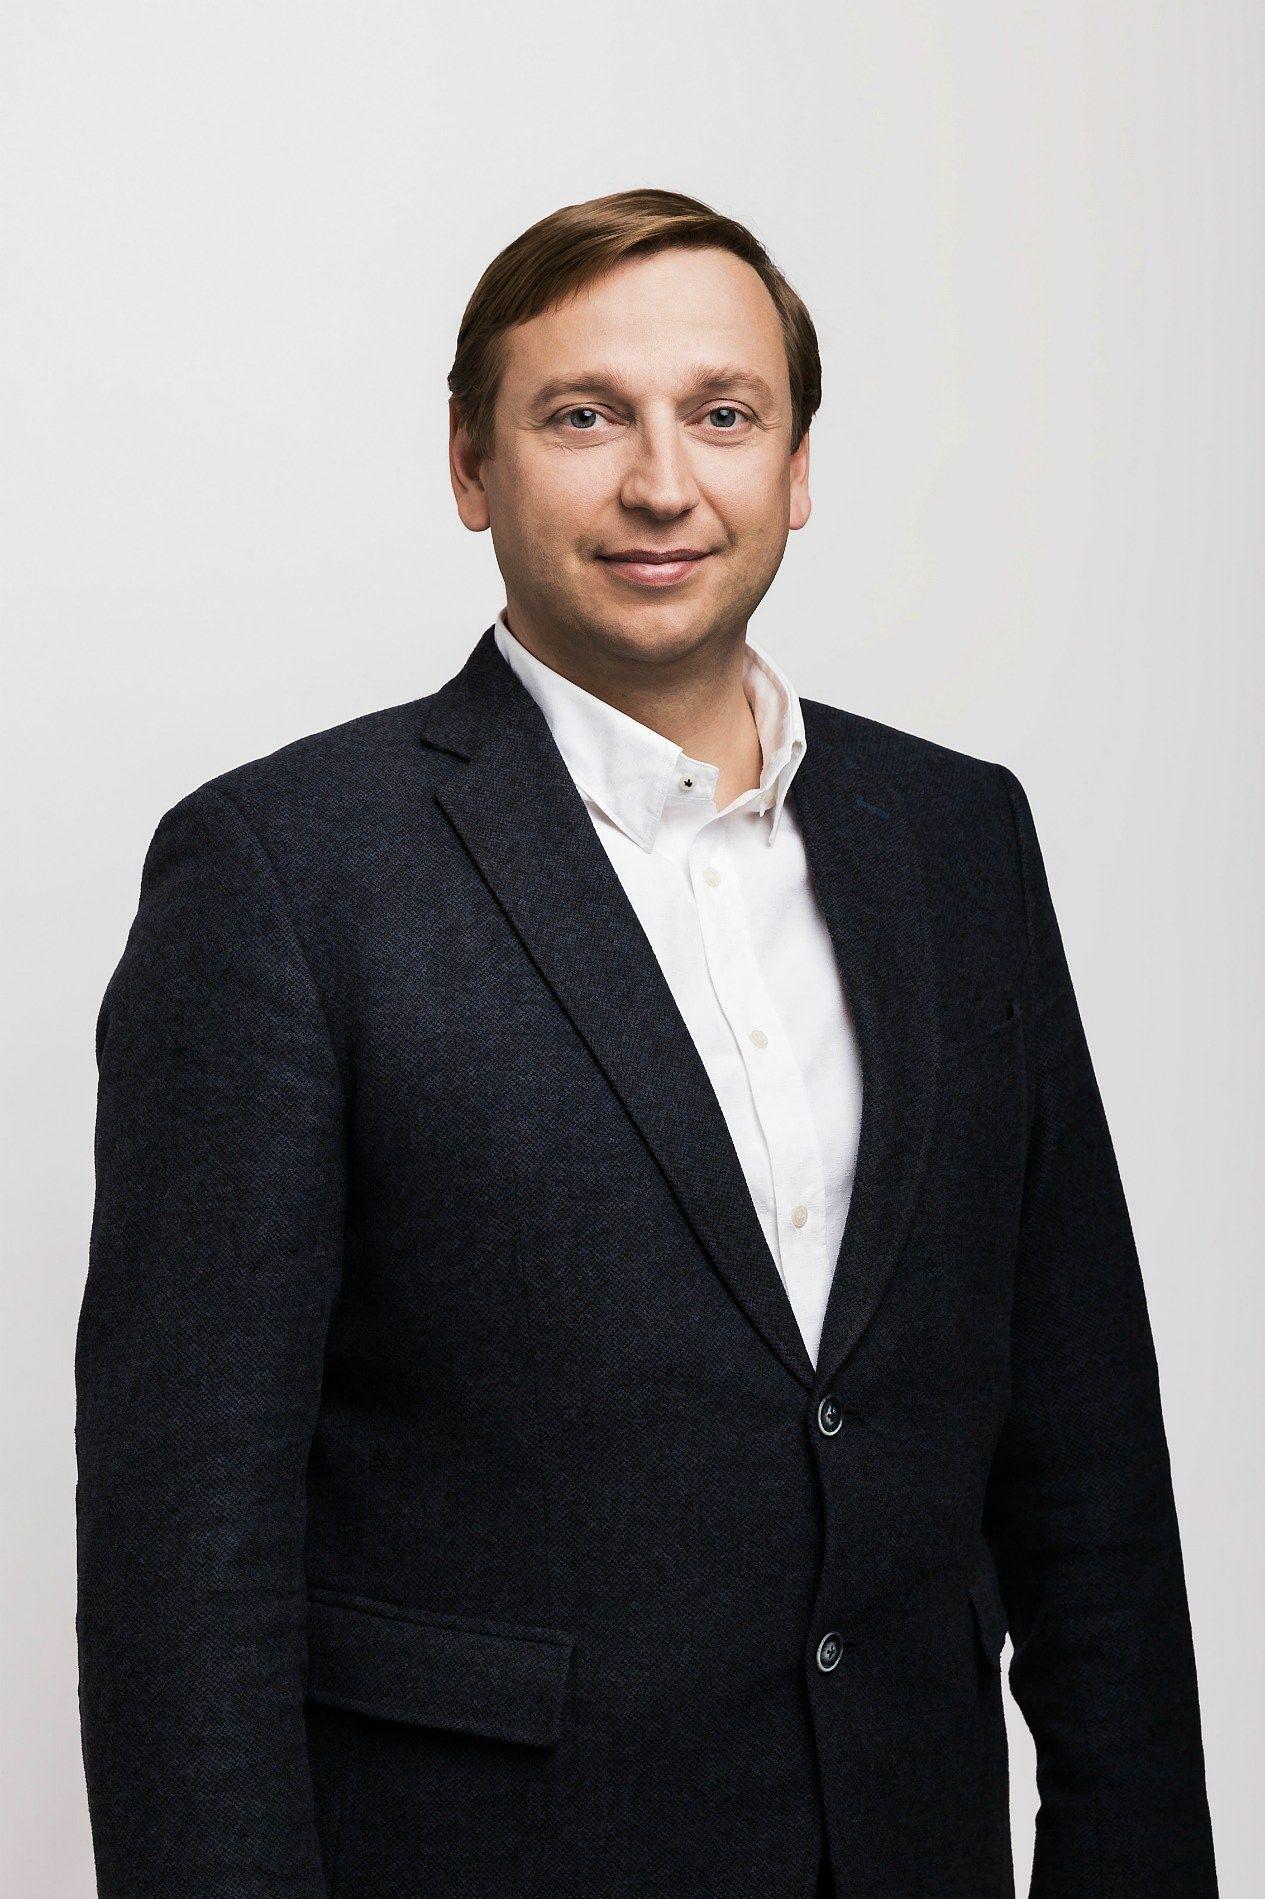 Remeikis v�l tapo �BnP Finance� valdybos nariu